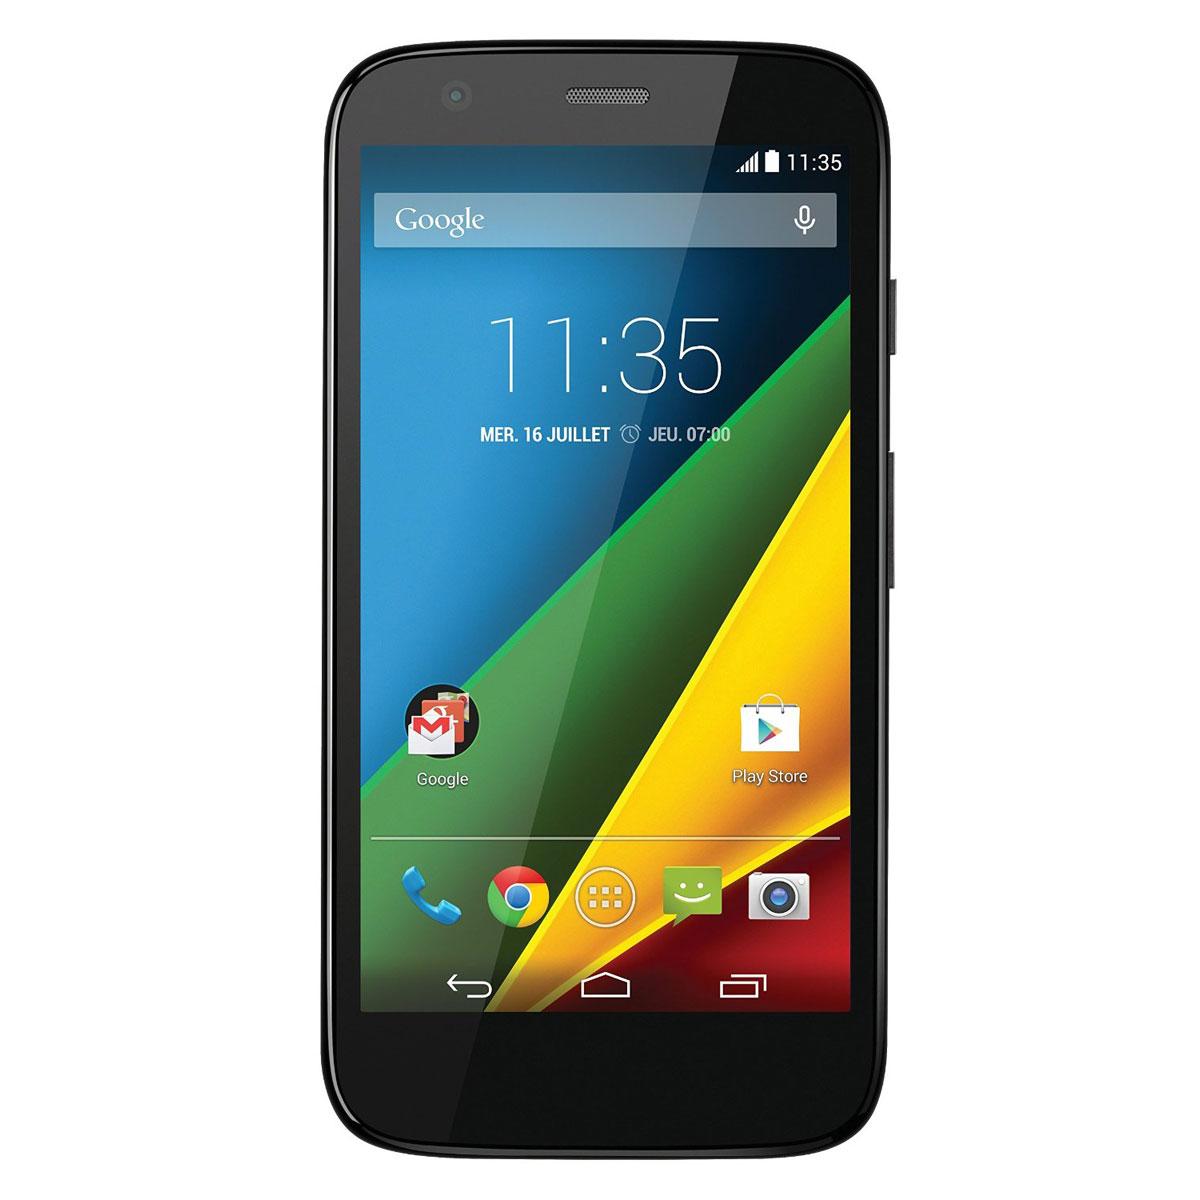 Motorola moto g 4g 8 go noir mobile smartphone for Photo ecran motorola